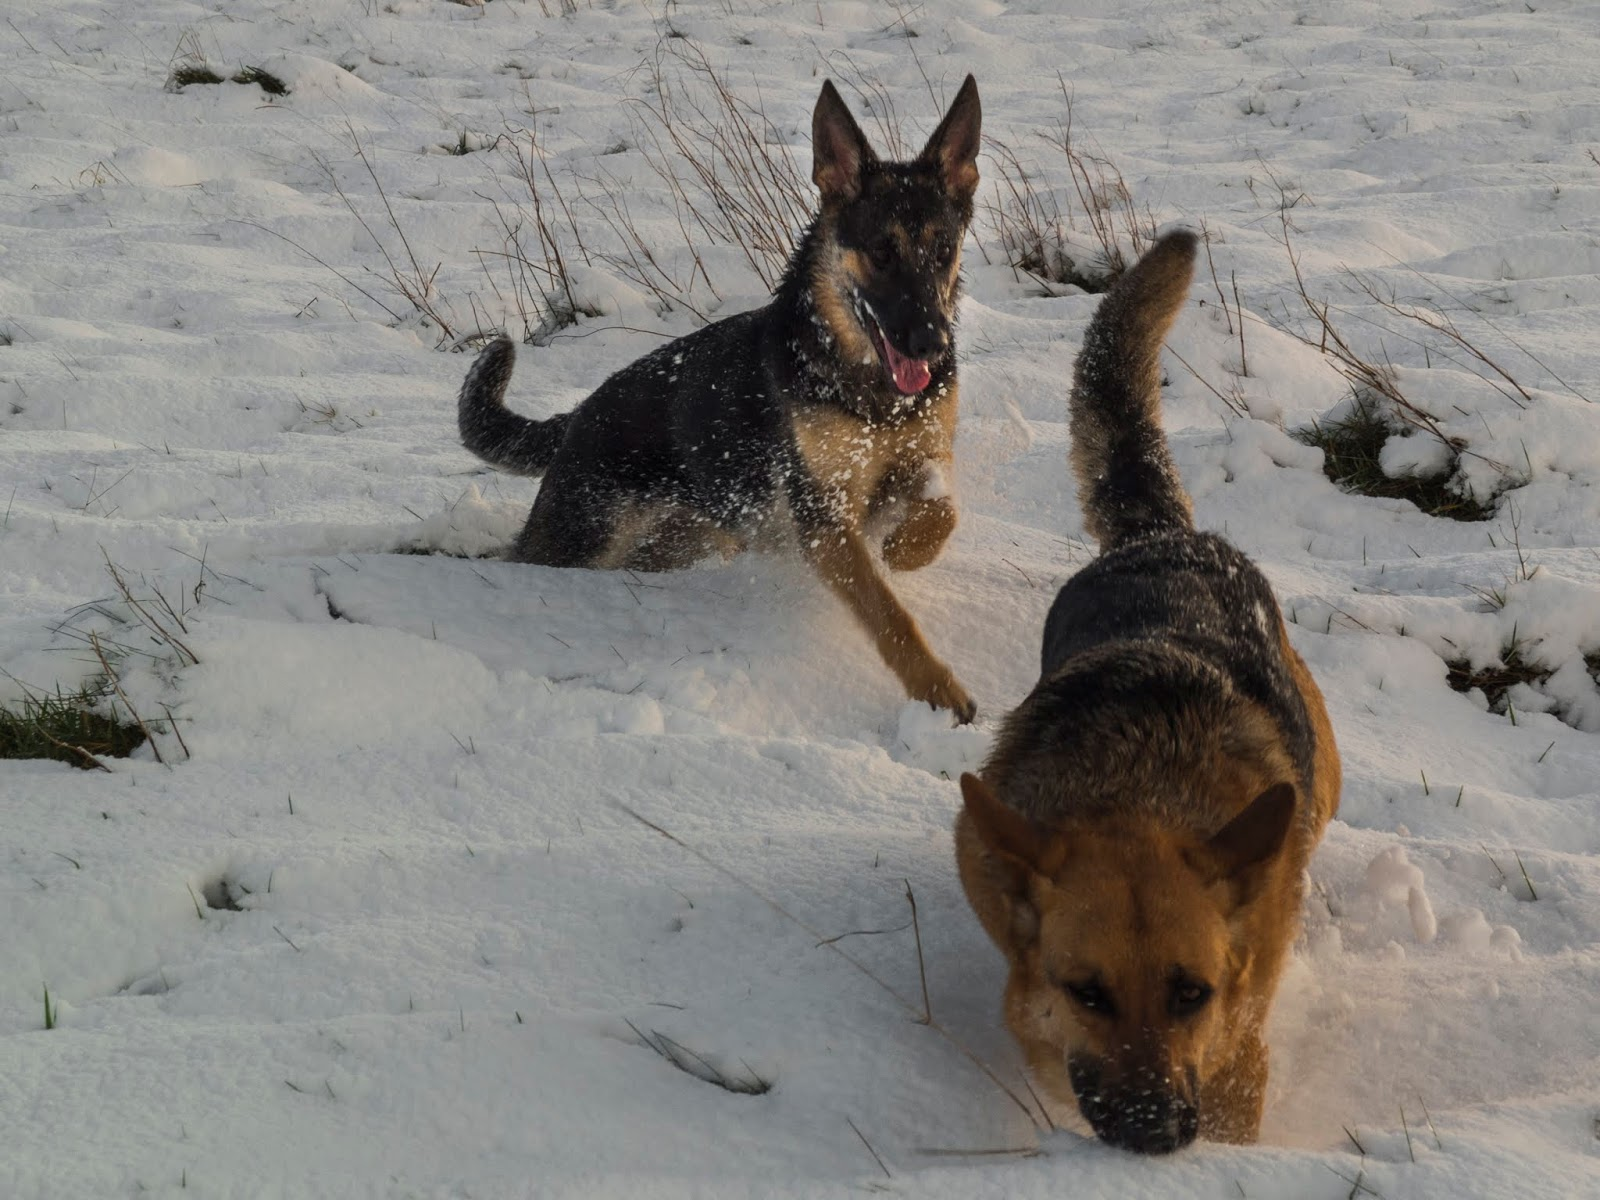 German Shepherd Poppy chasing her mom Nala down a snowy hillside.